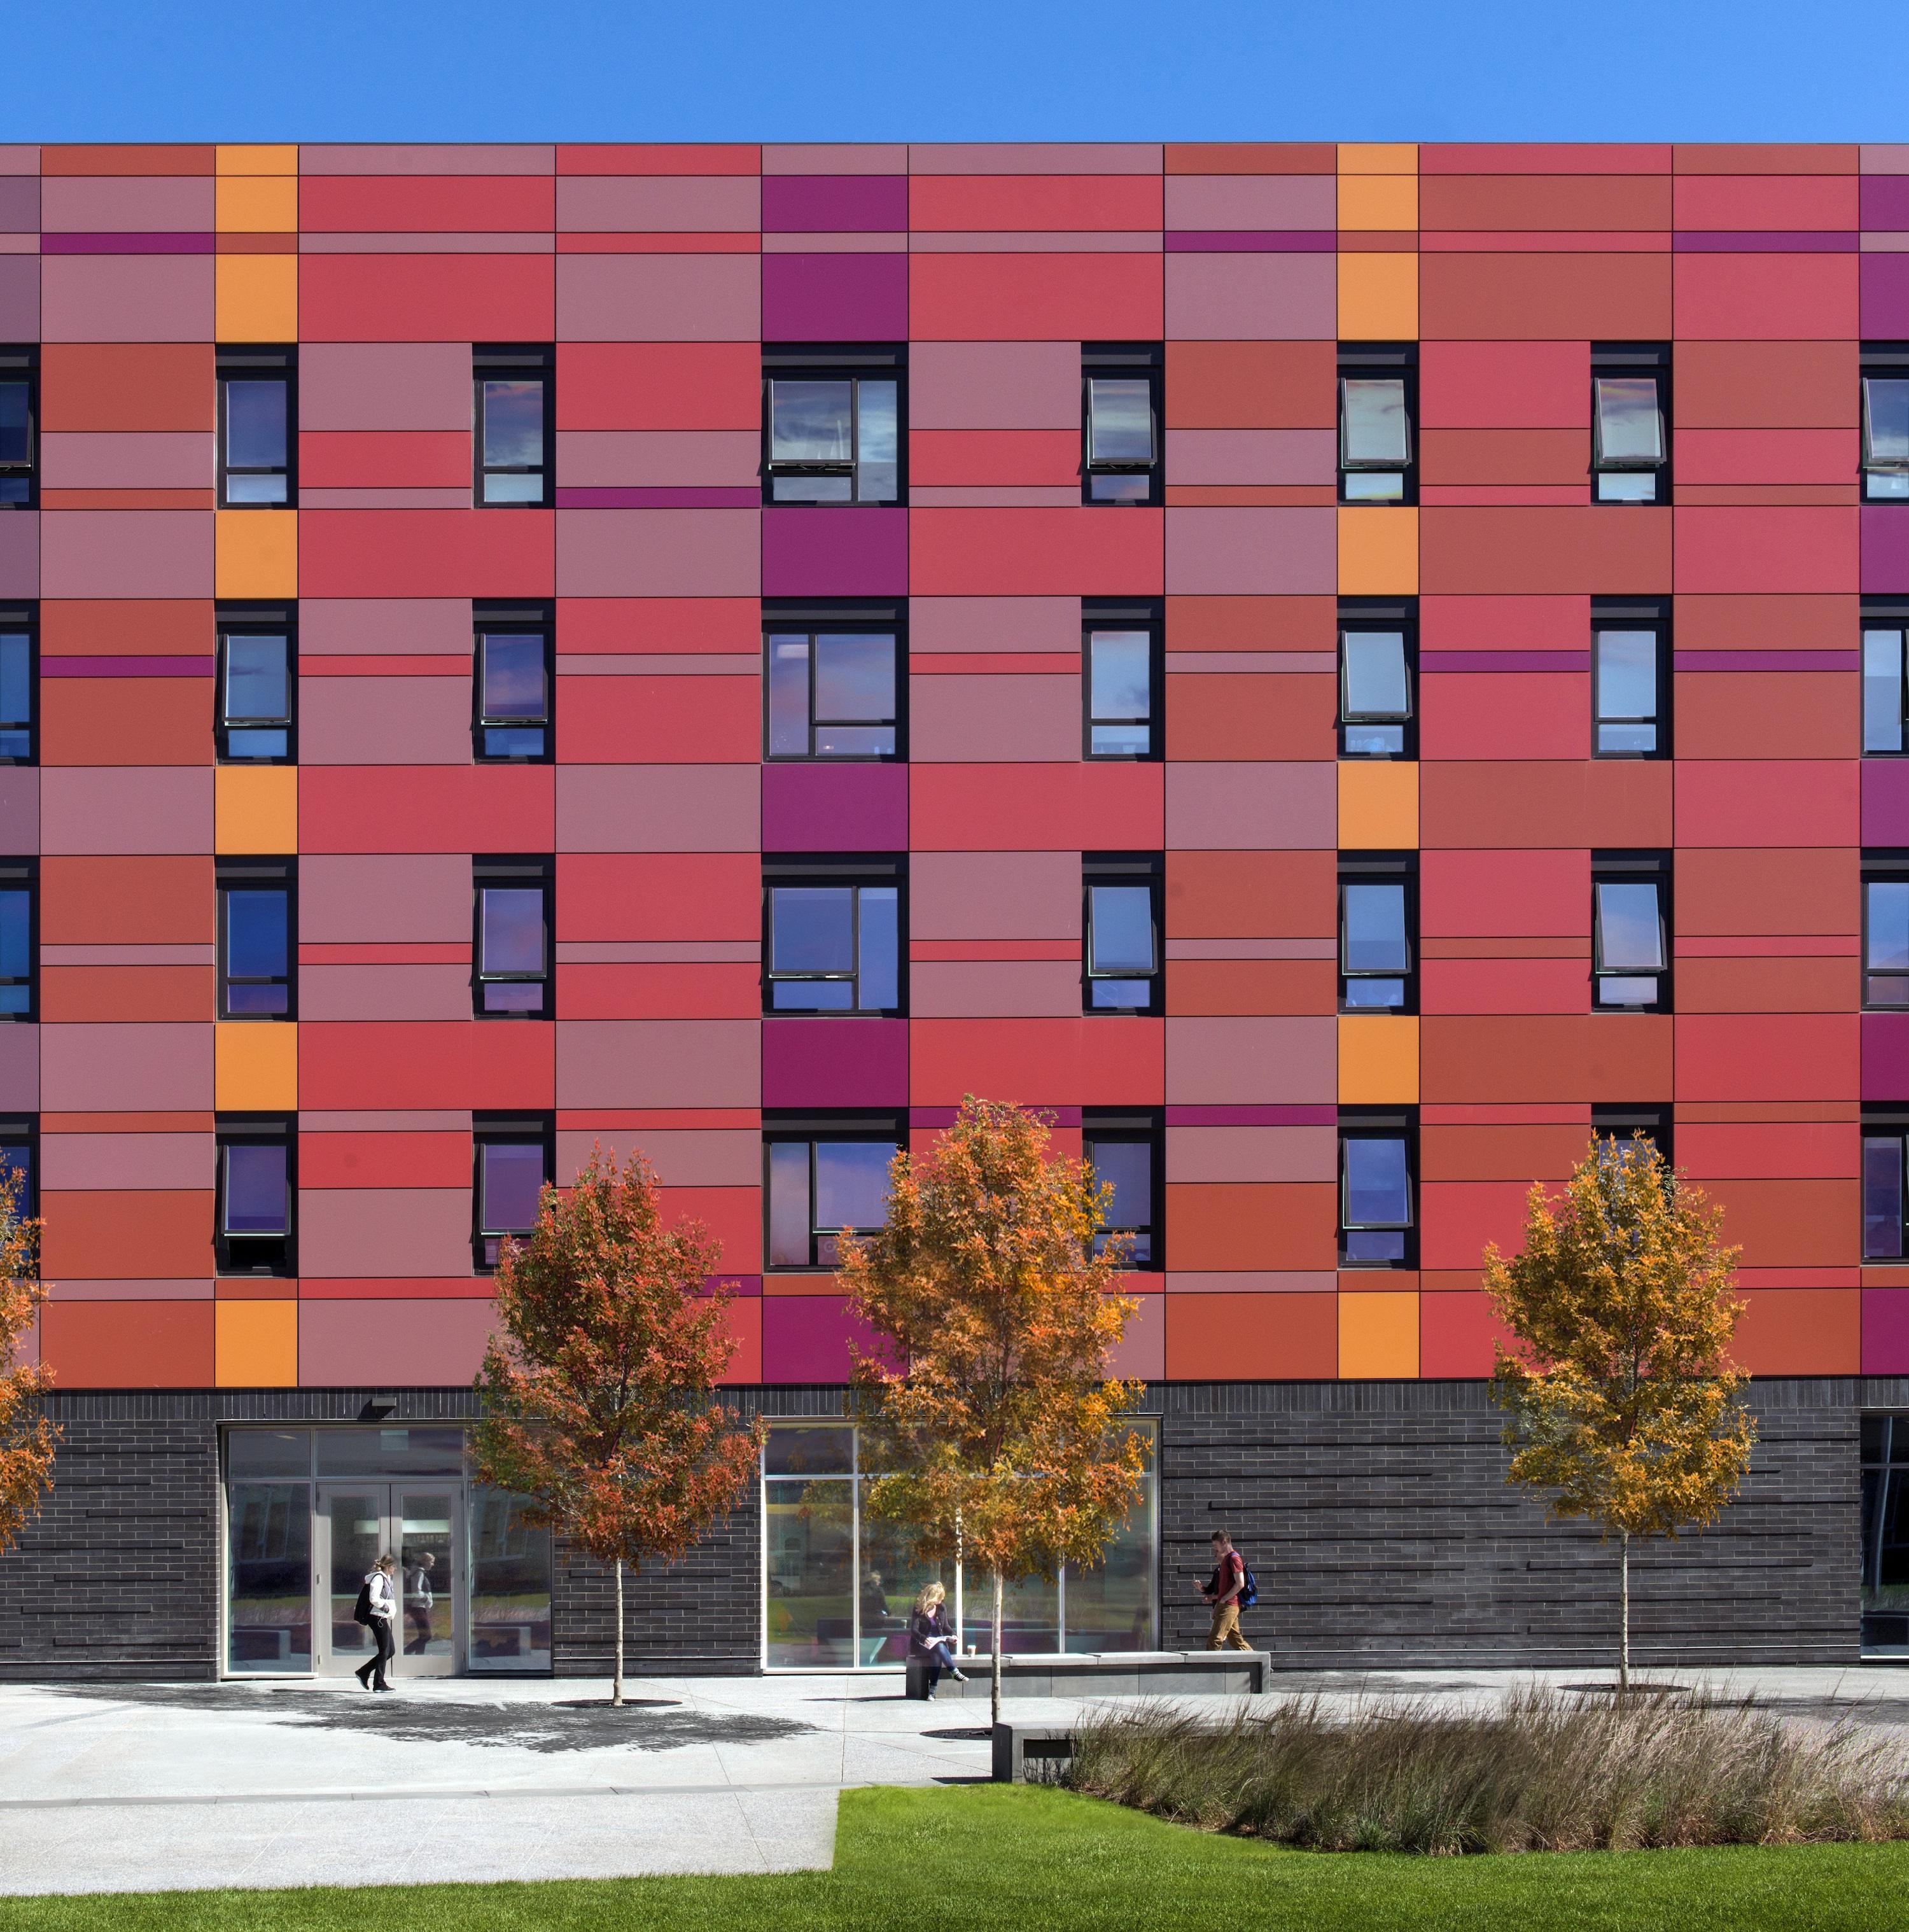 Umass Lowell S New 54 Million University Suites Designed